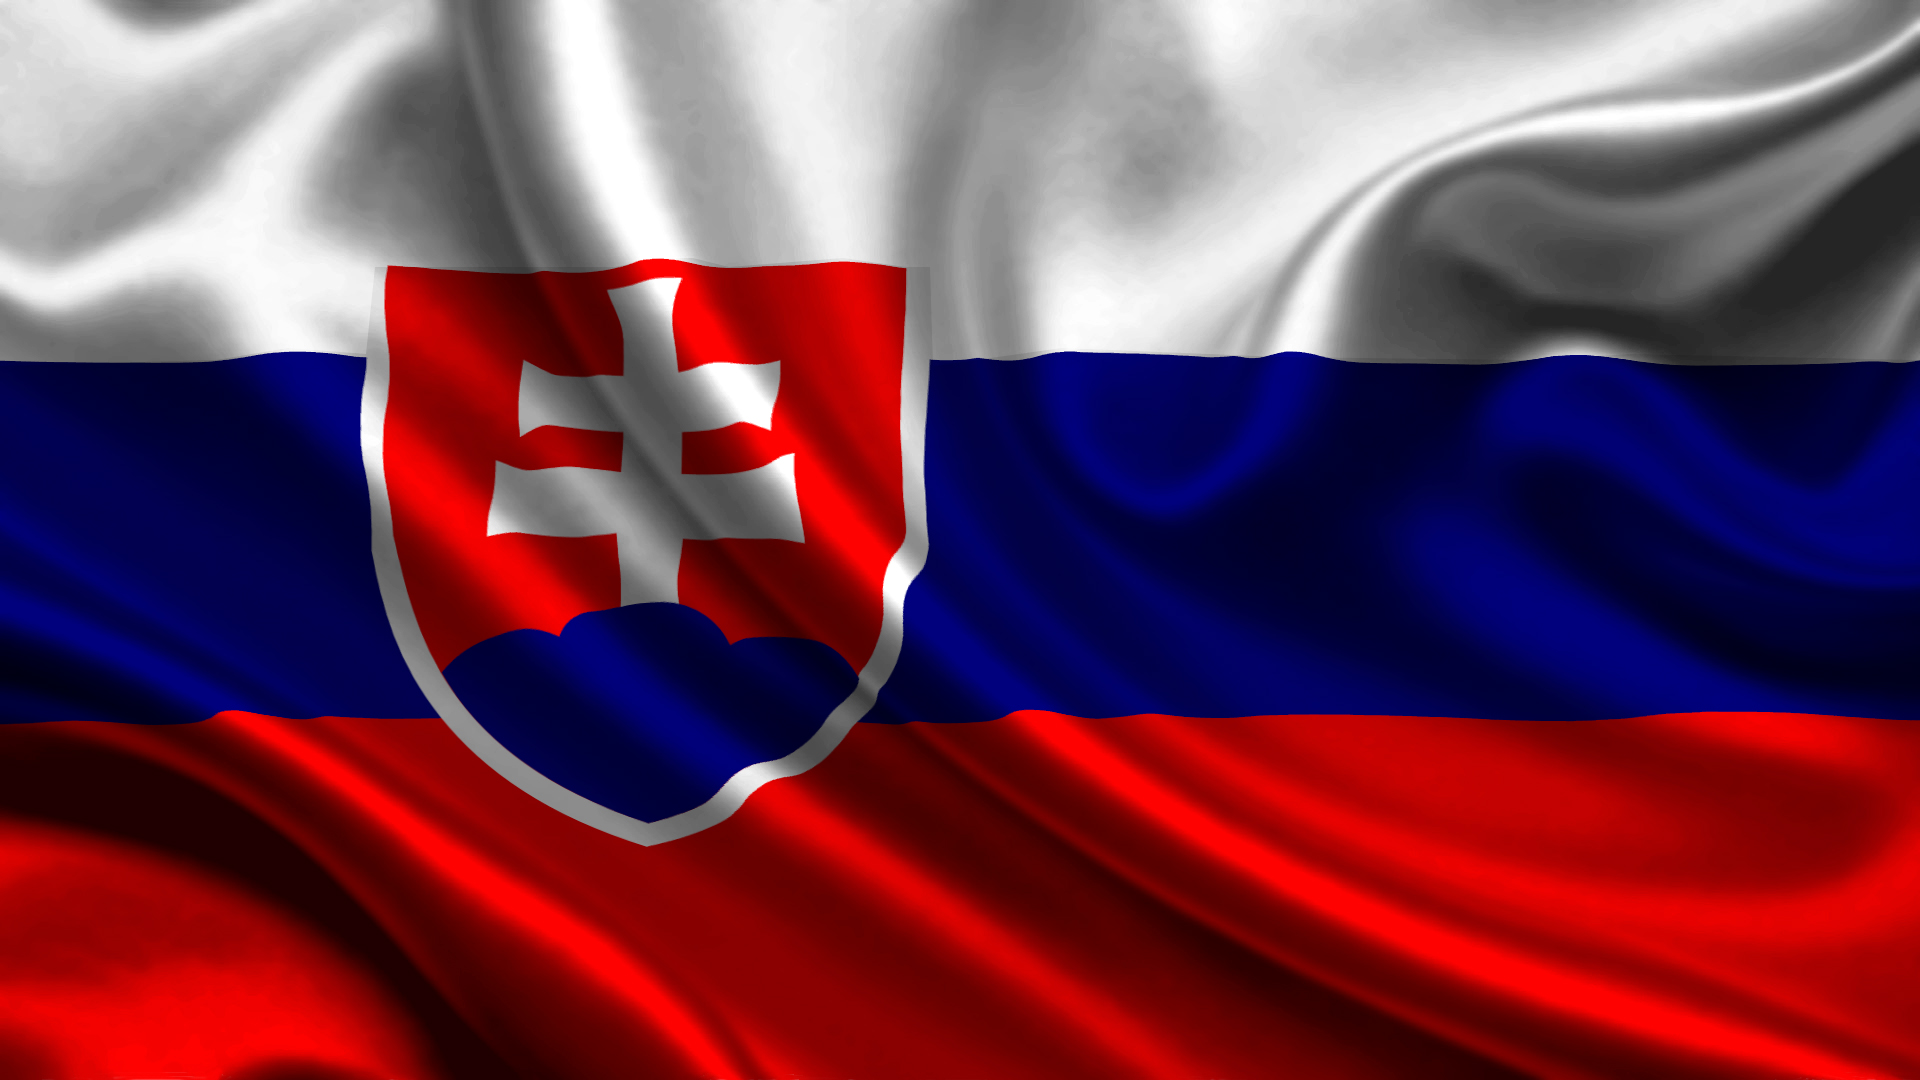 Wallpapers Slovakia Flag Stripes 1920x1080 1920x1080